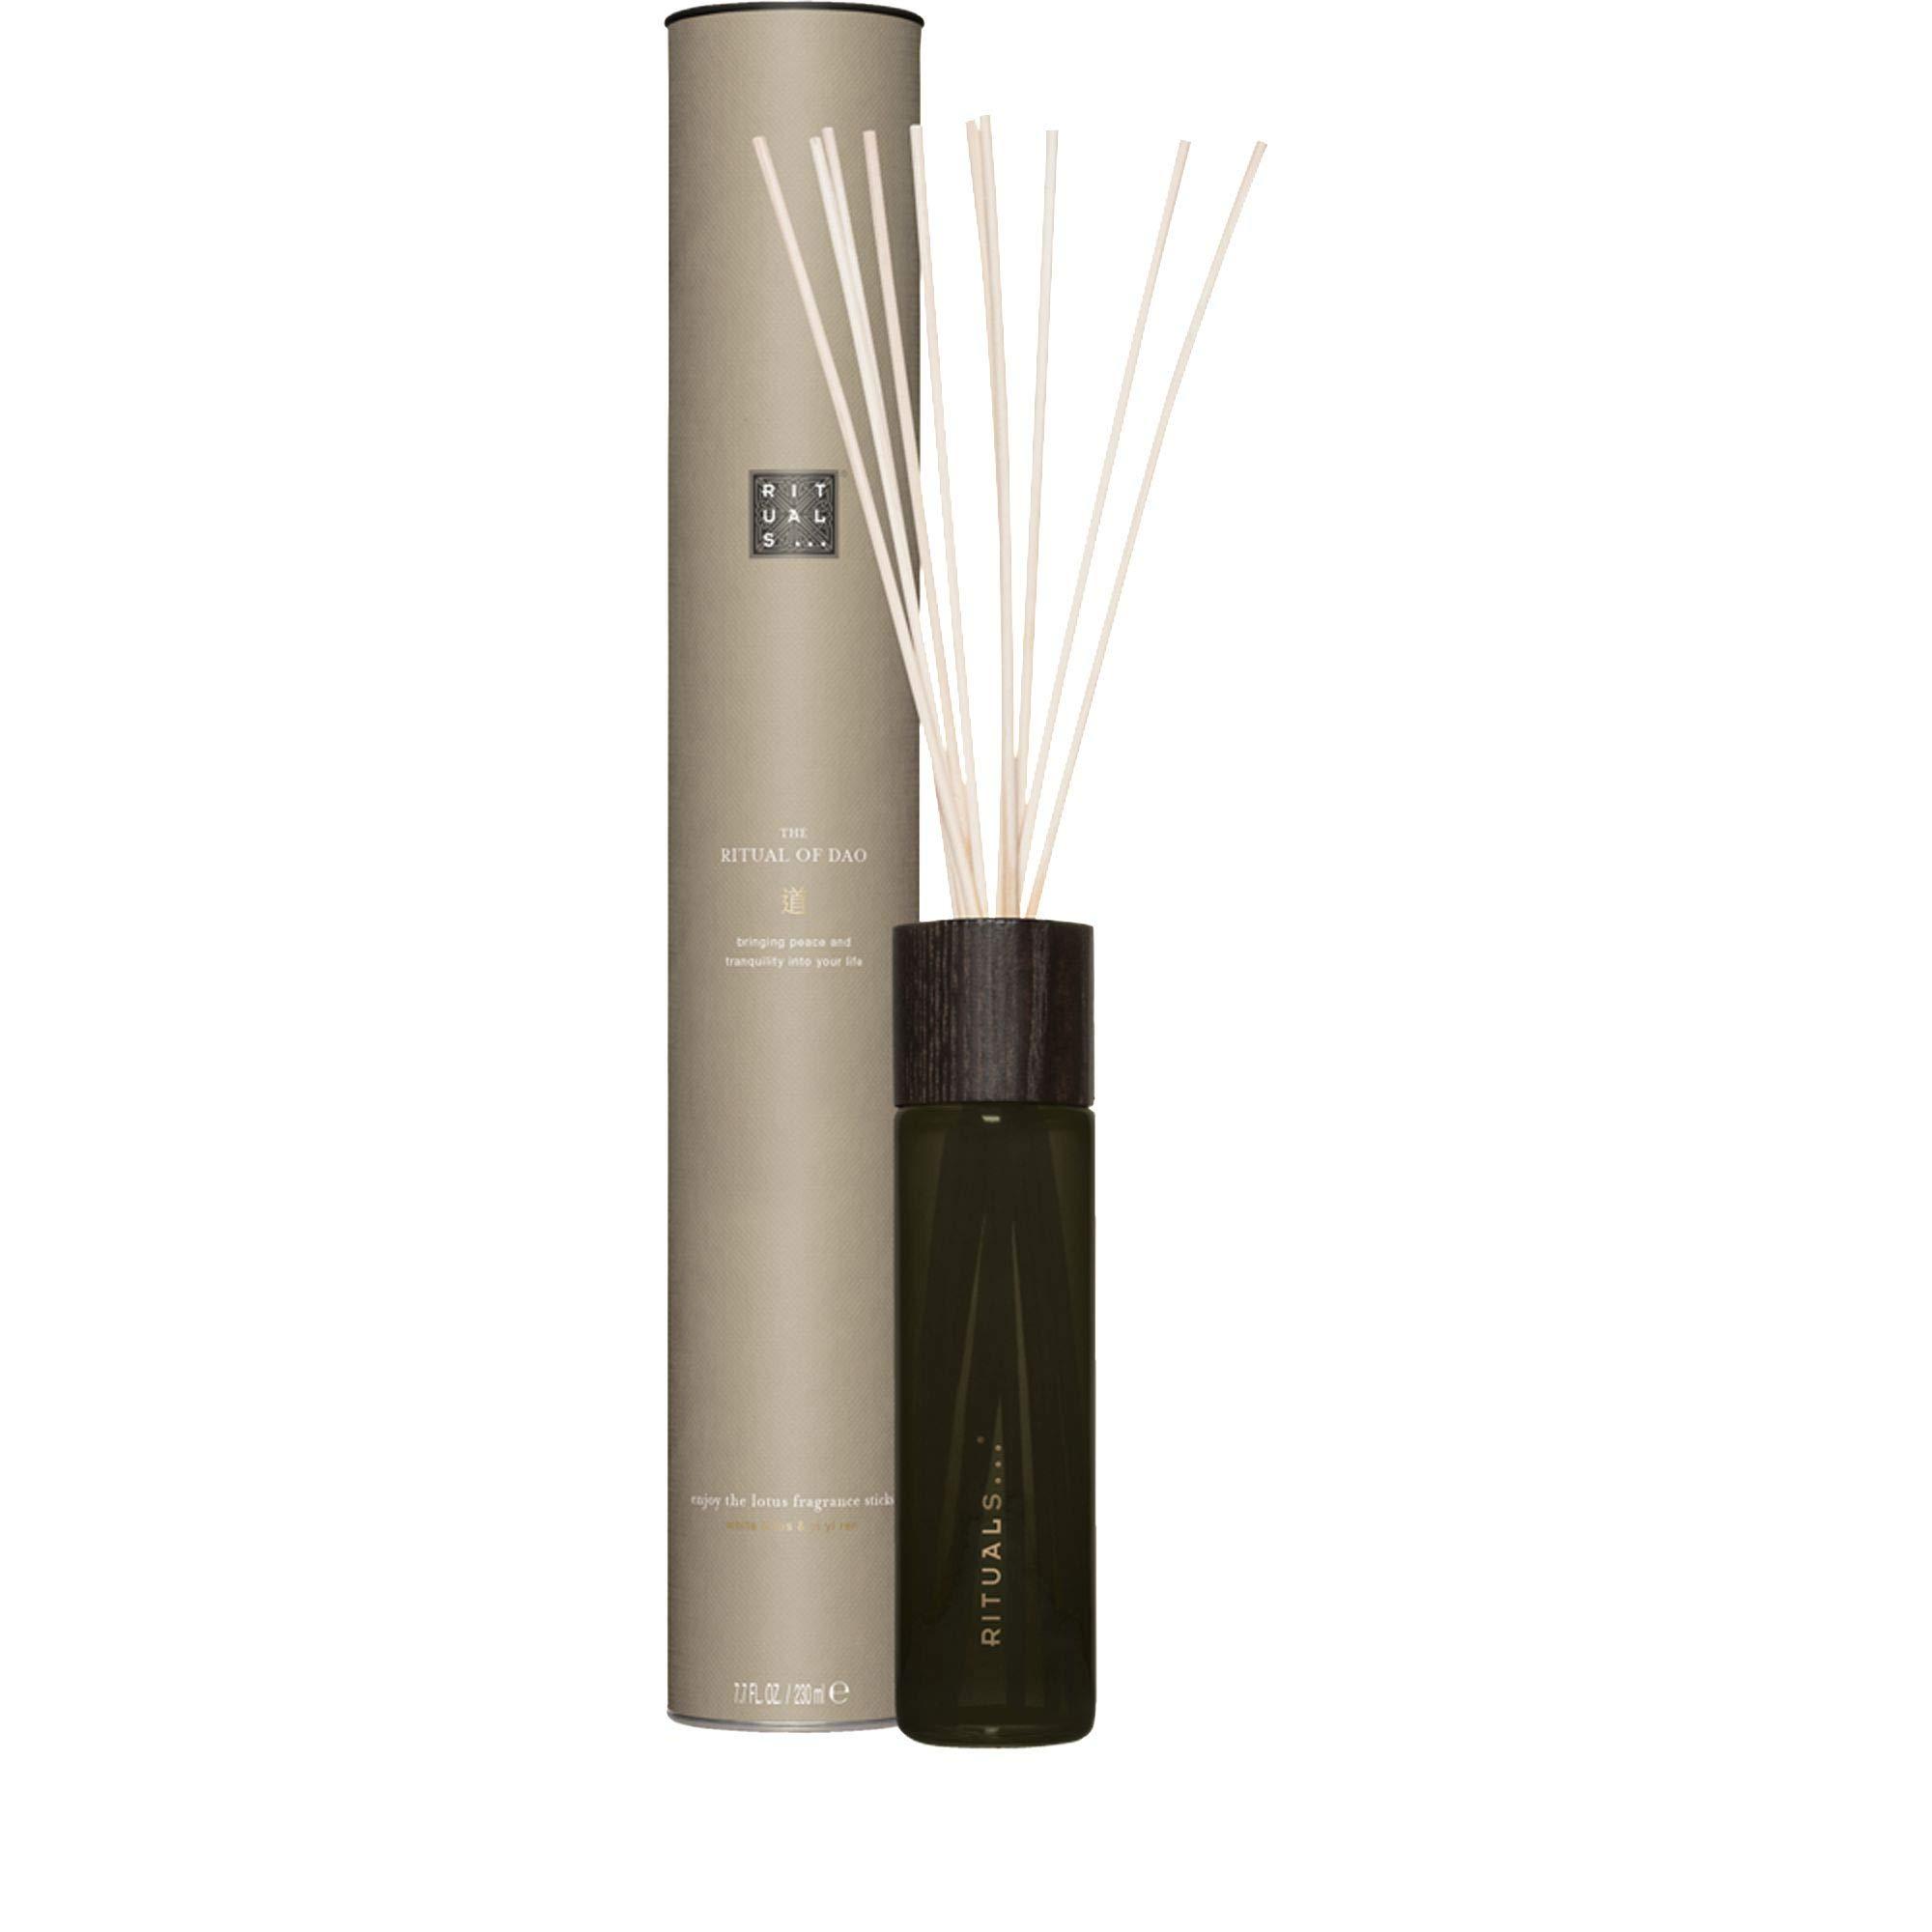 Rituals The Ritual of Dao Fragrance Sticks, 7.78 fl. oz.